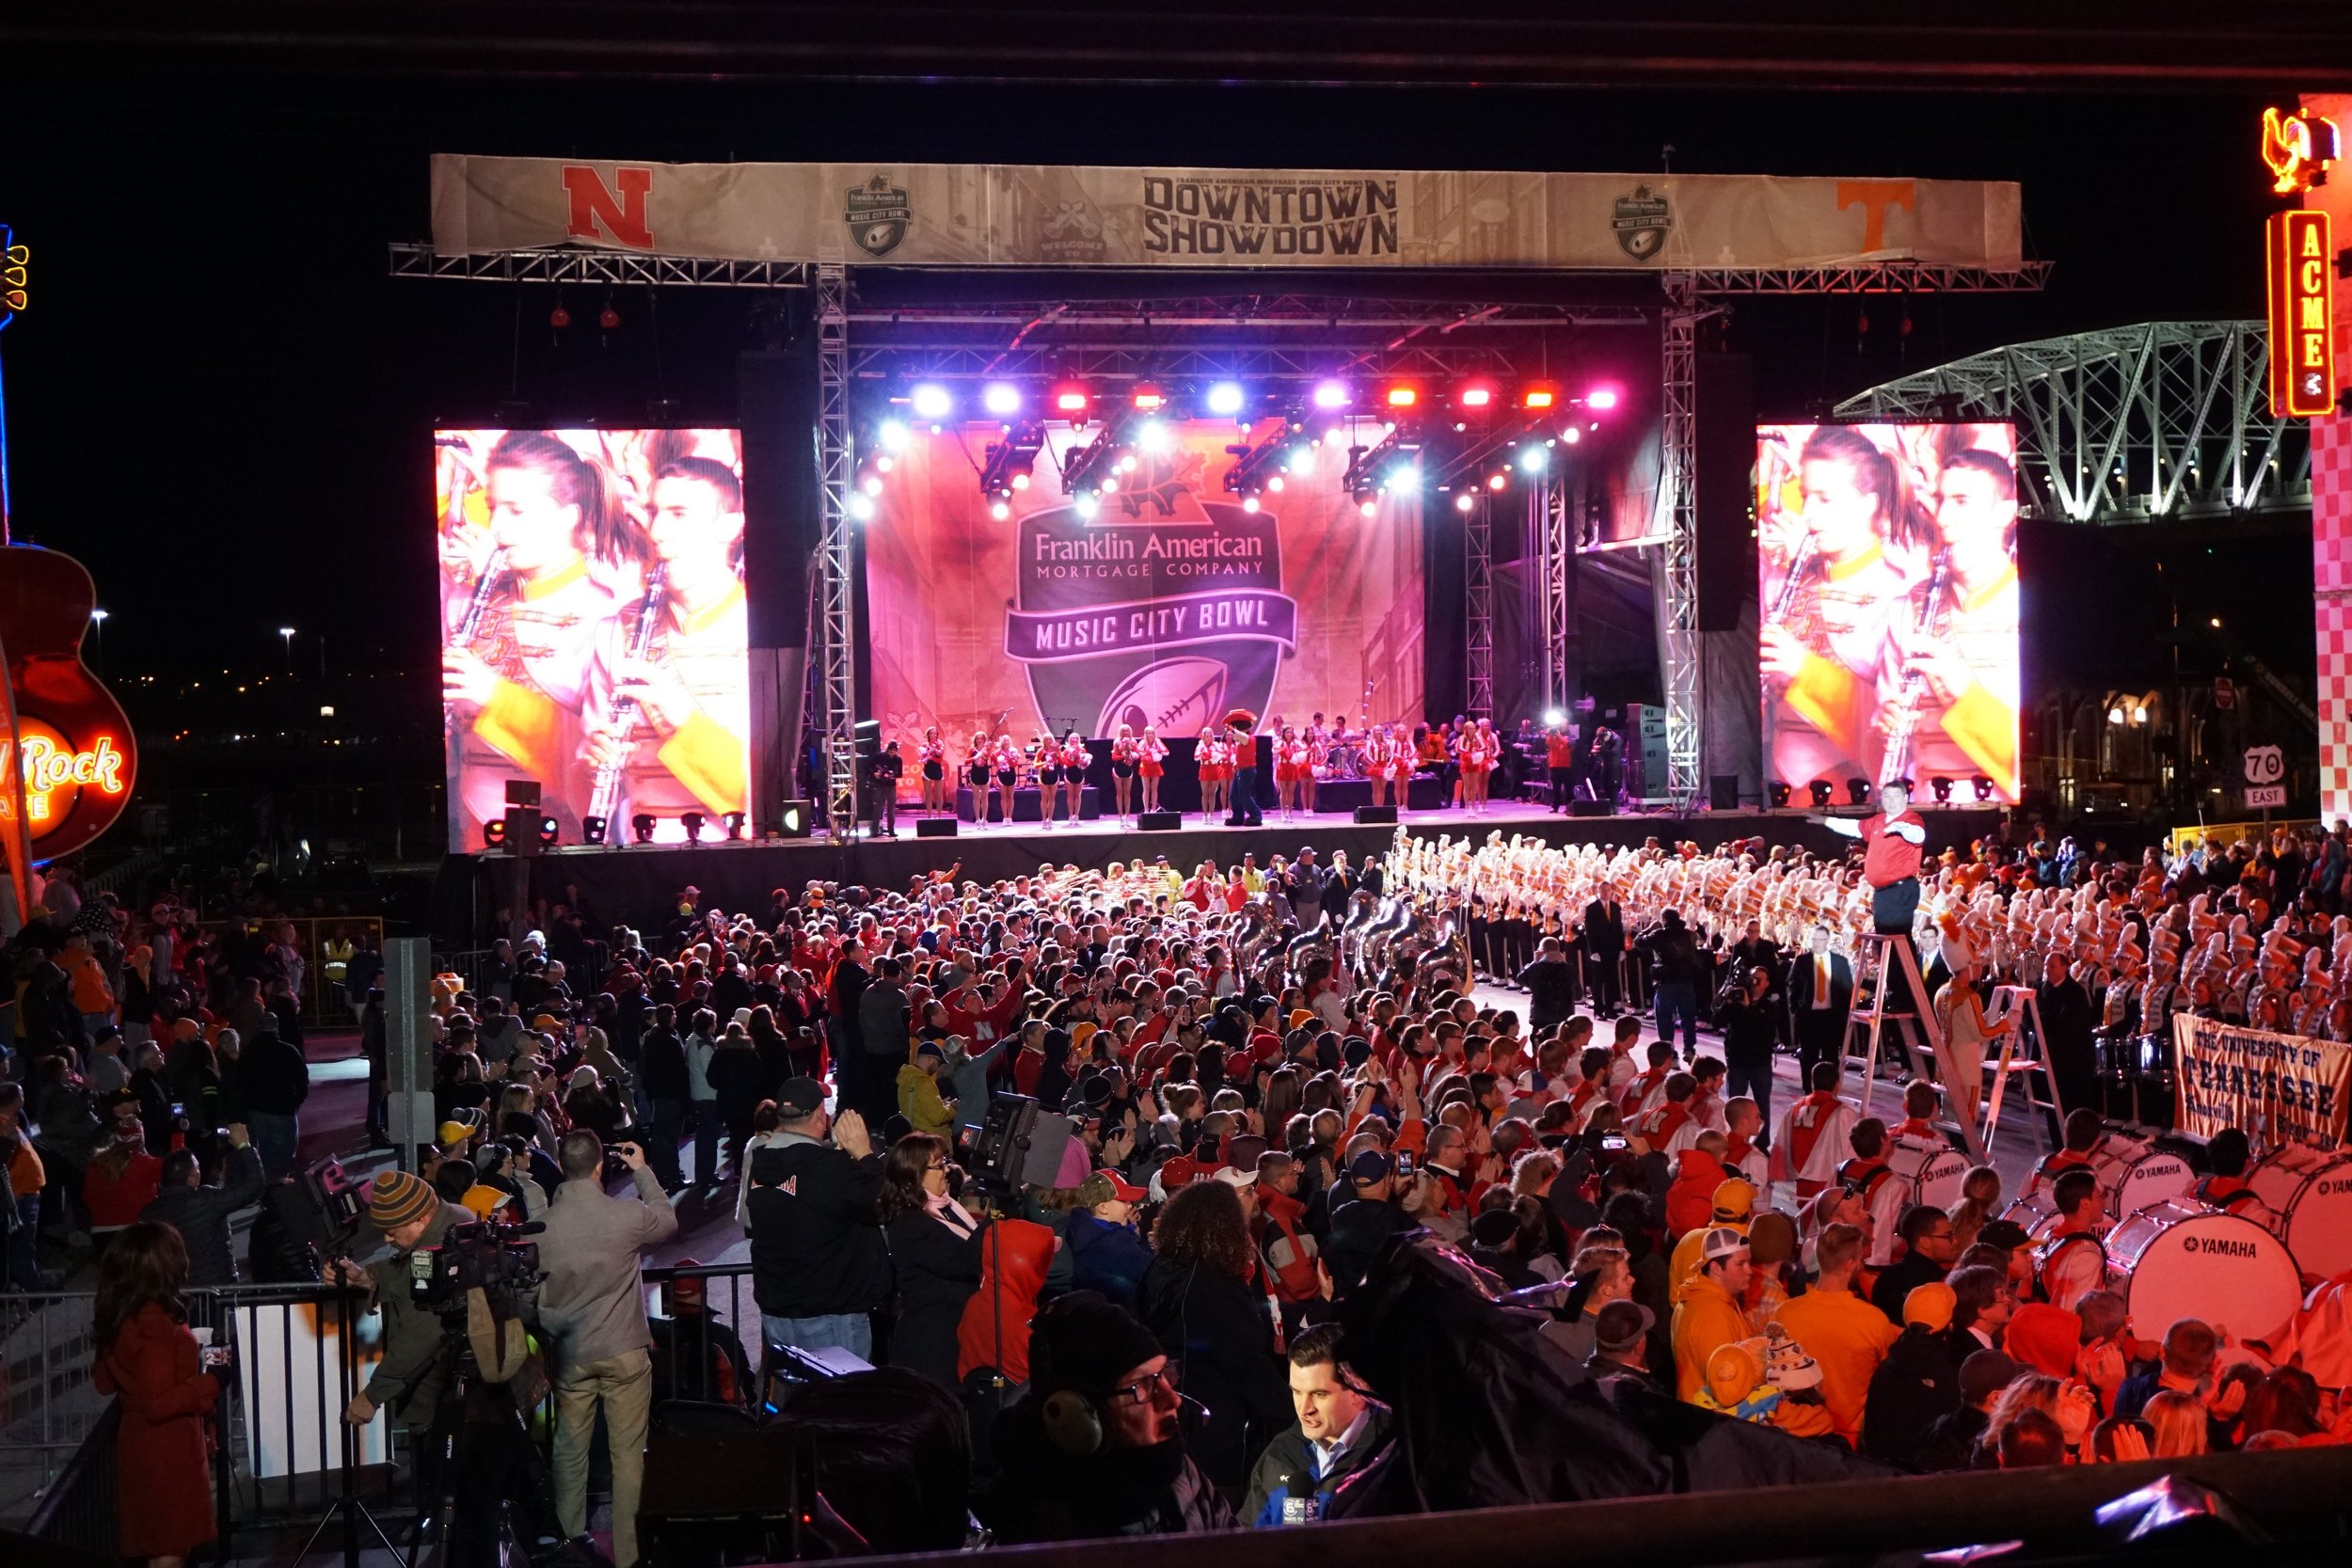 Music City Bowl 2016